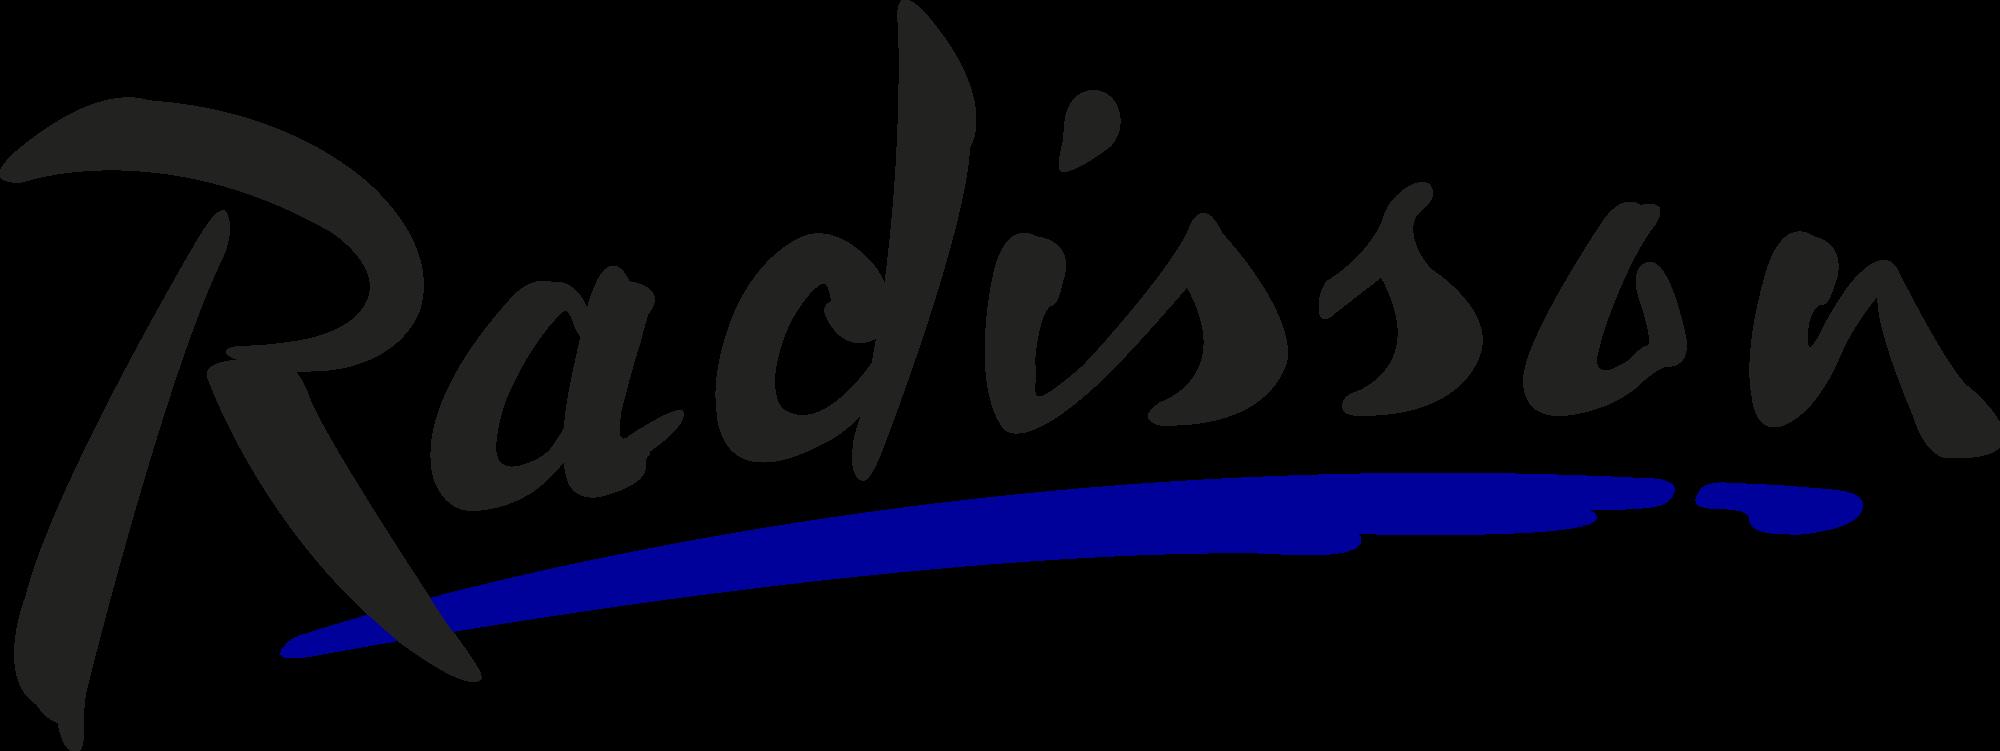 RadissonRus